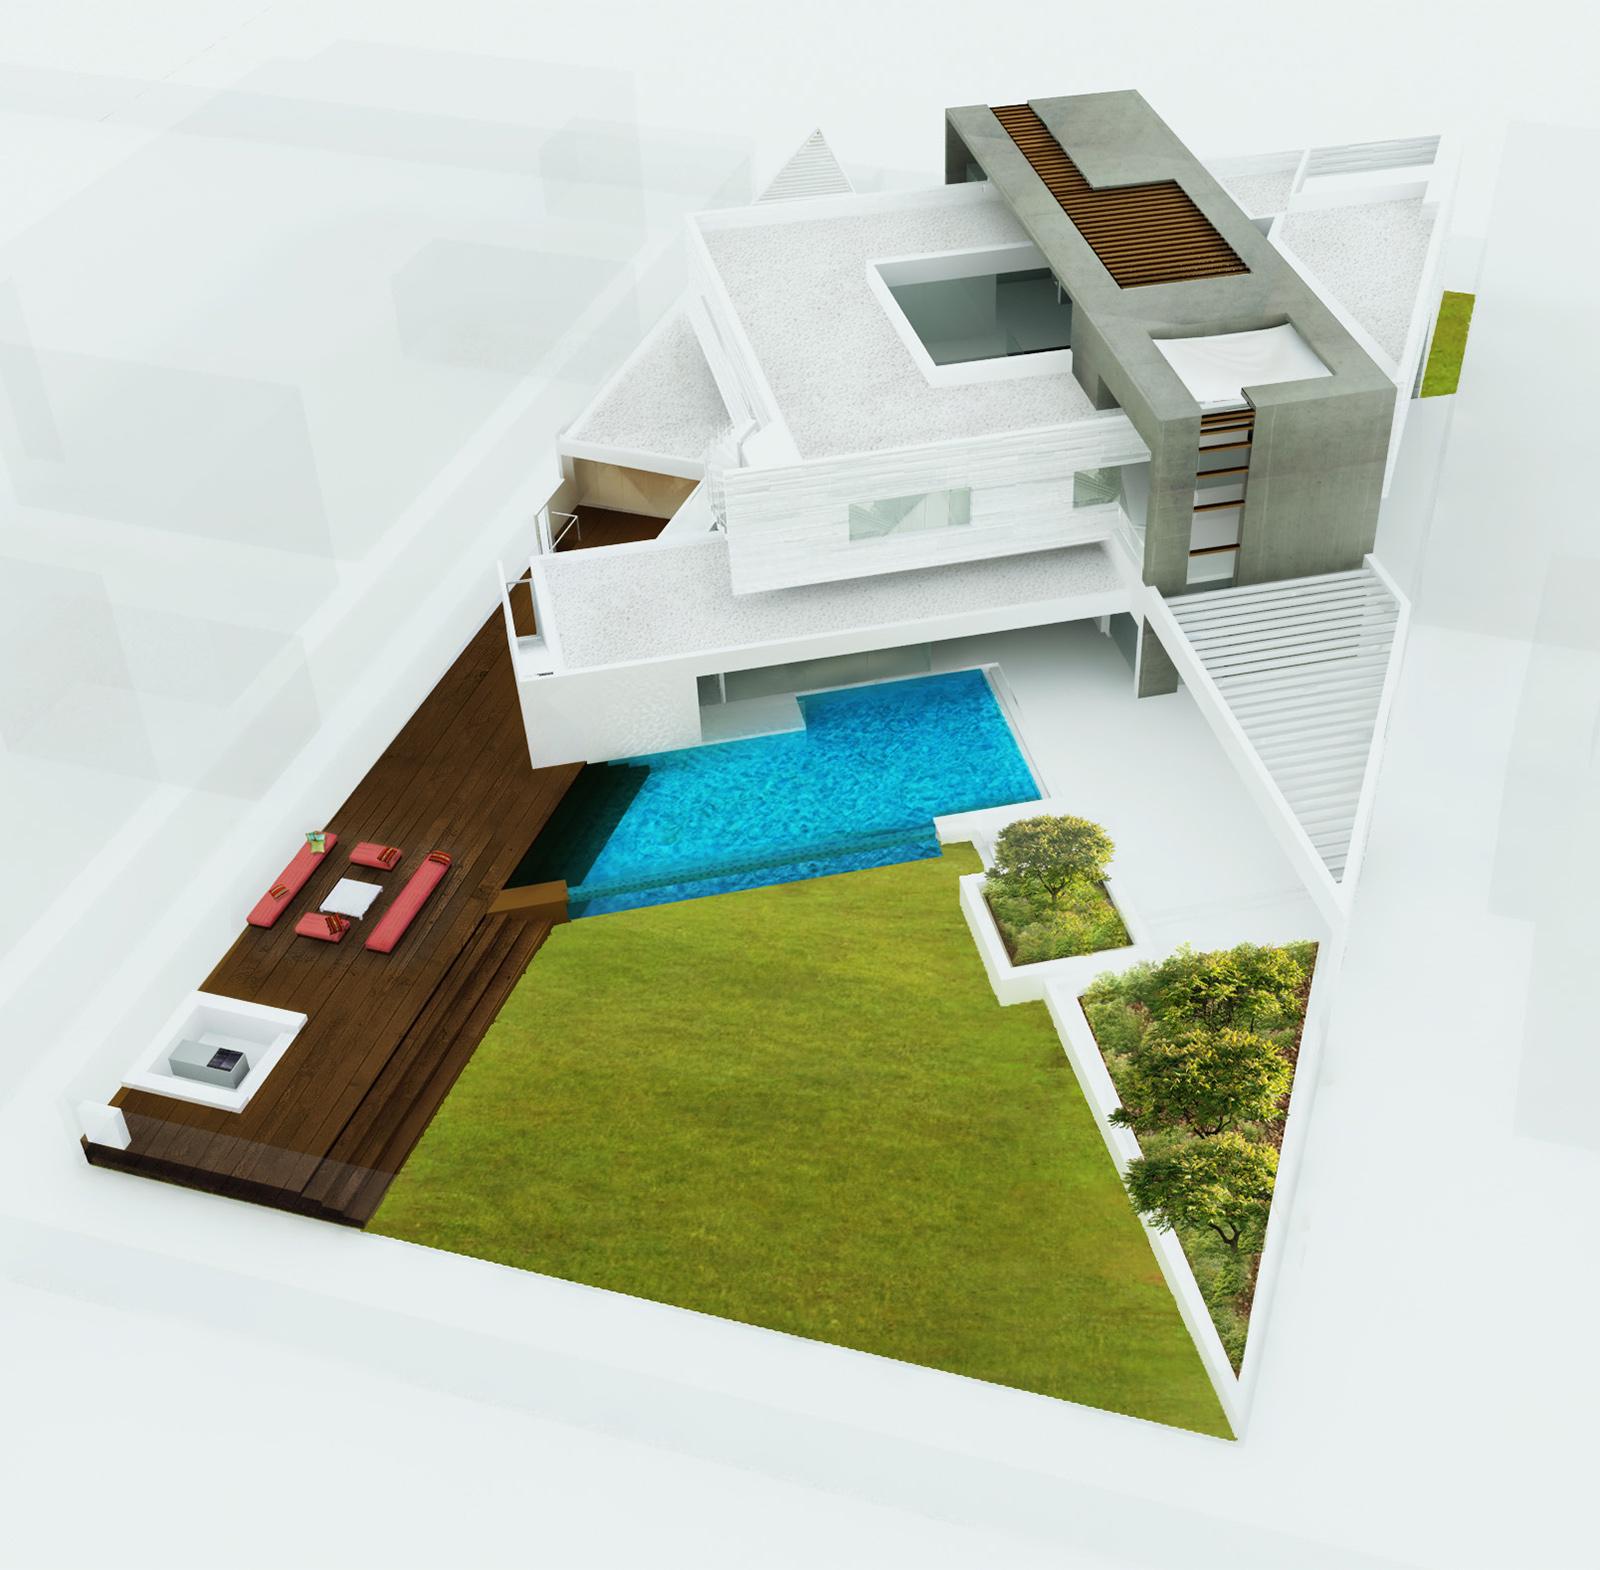 BEAD Contemporary villa top view 2.JPG